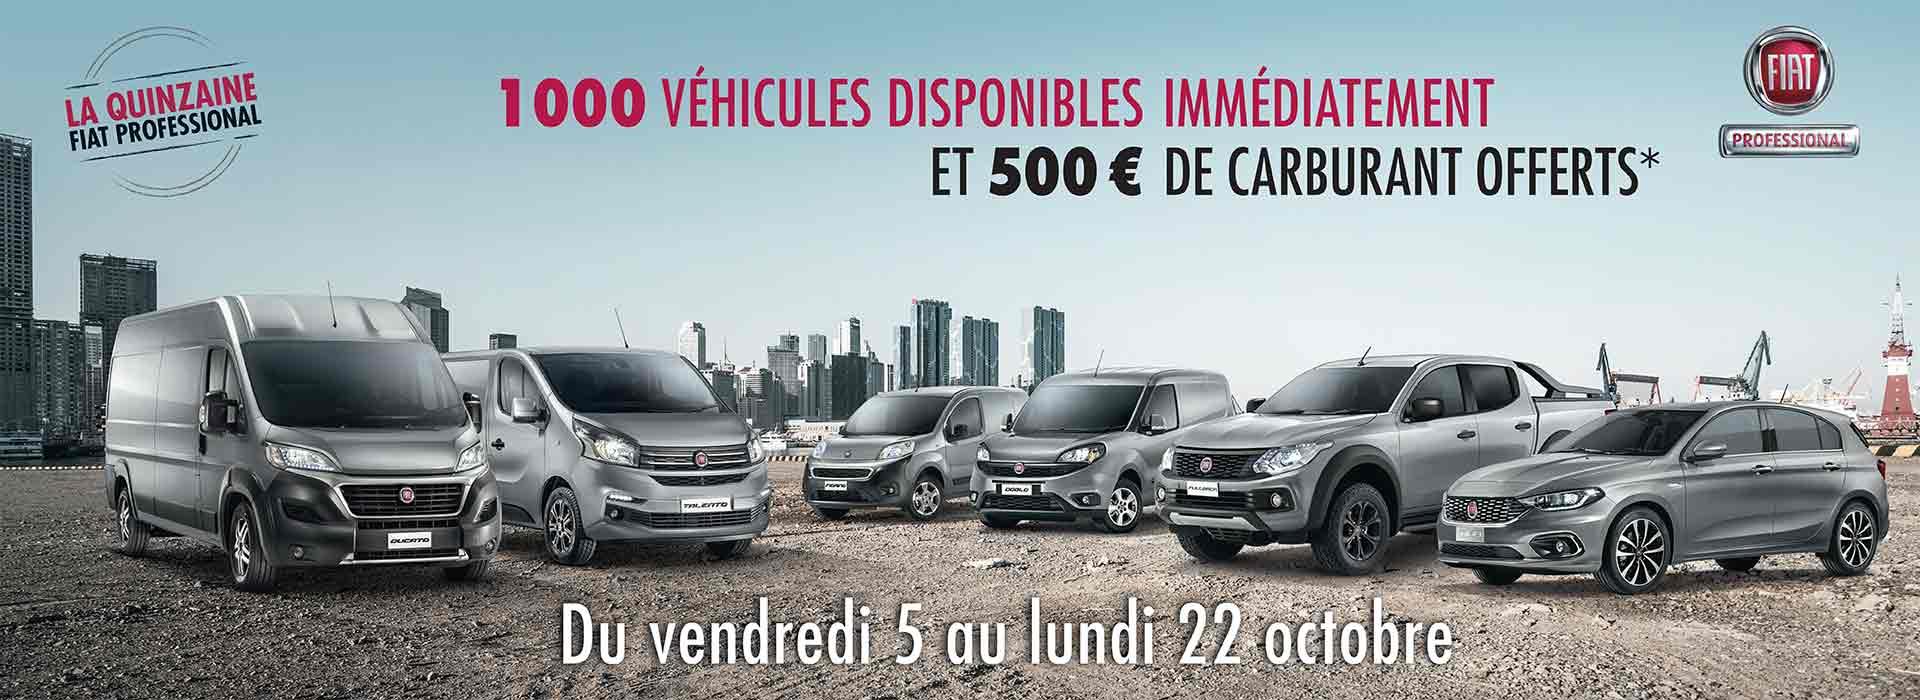 Fiat dijon vente voiture neuve vehicule occasion for Garage vente voiture occasion dijon